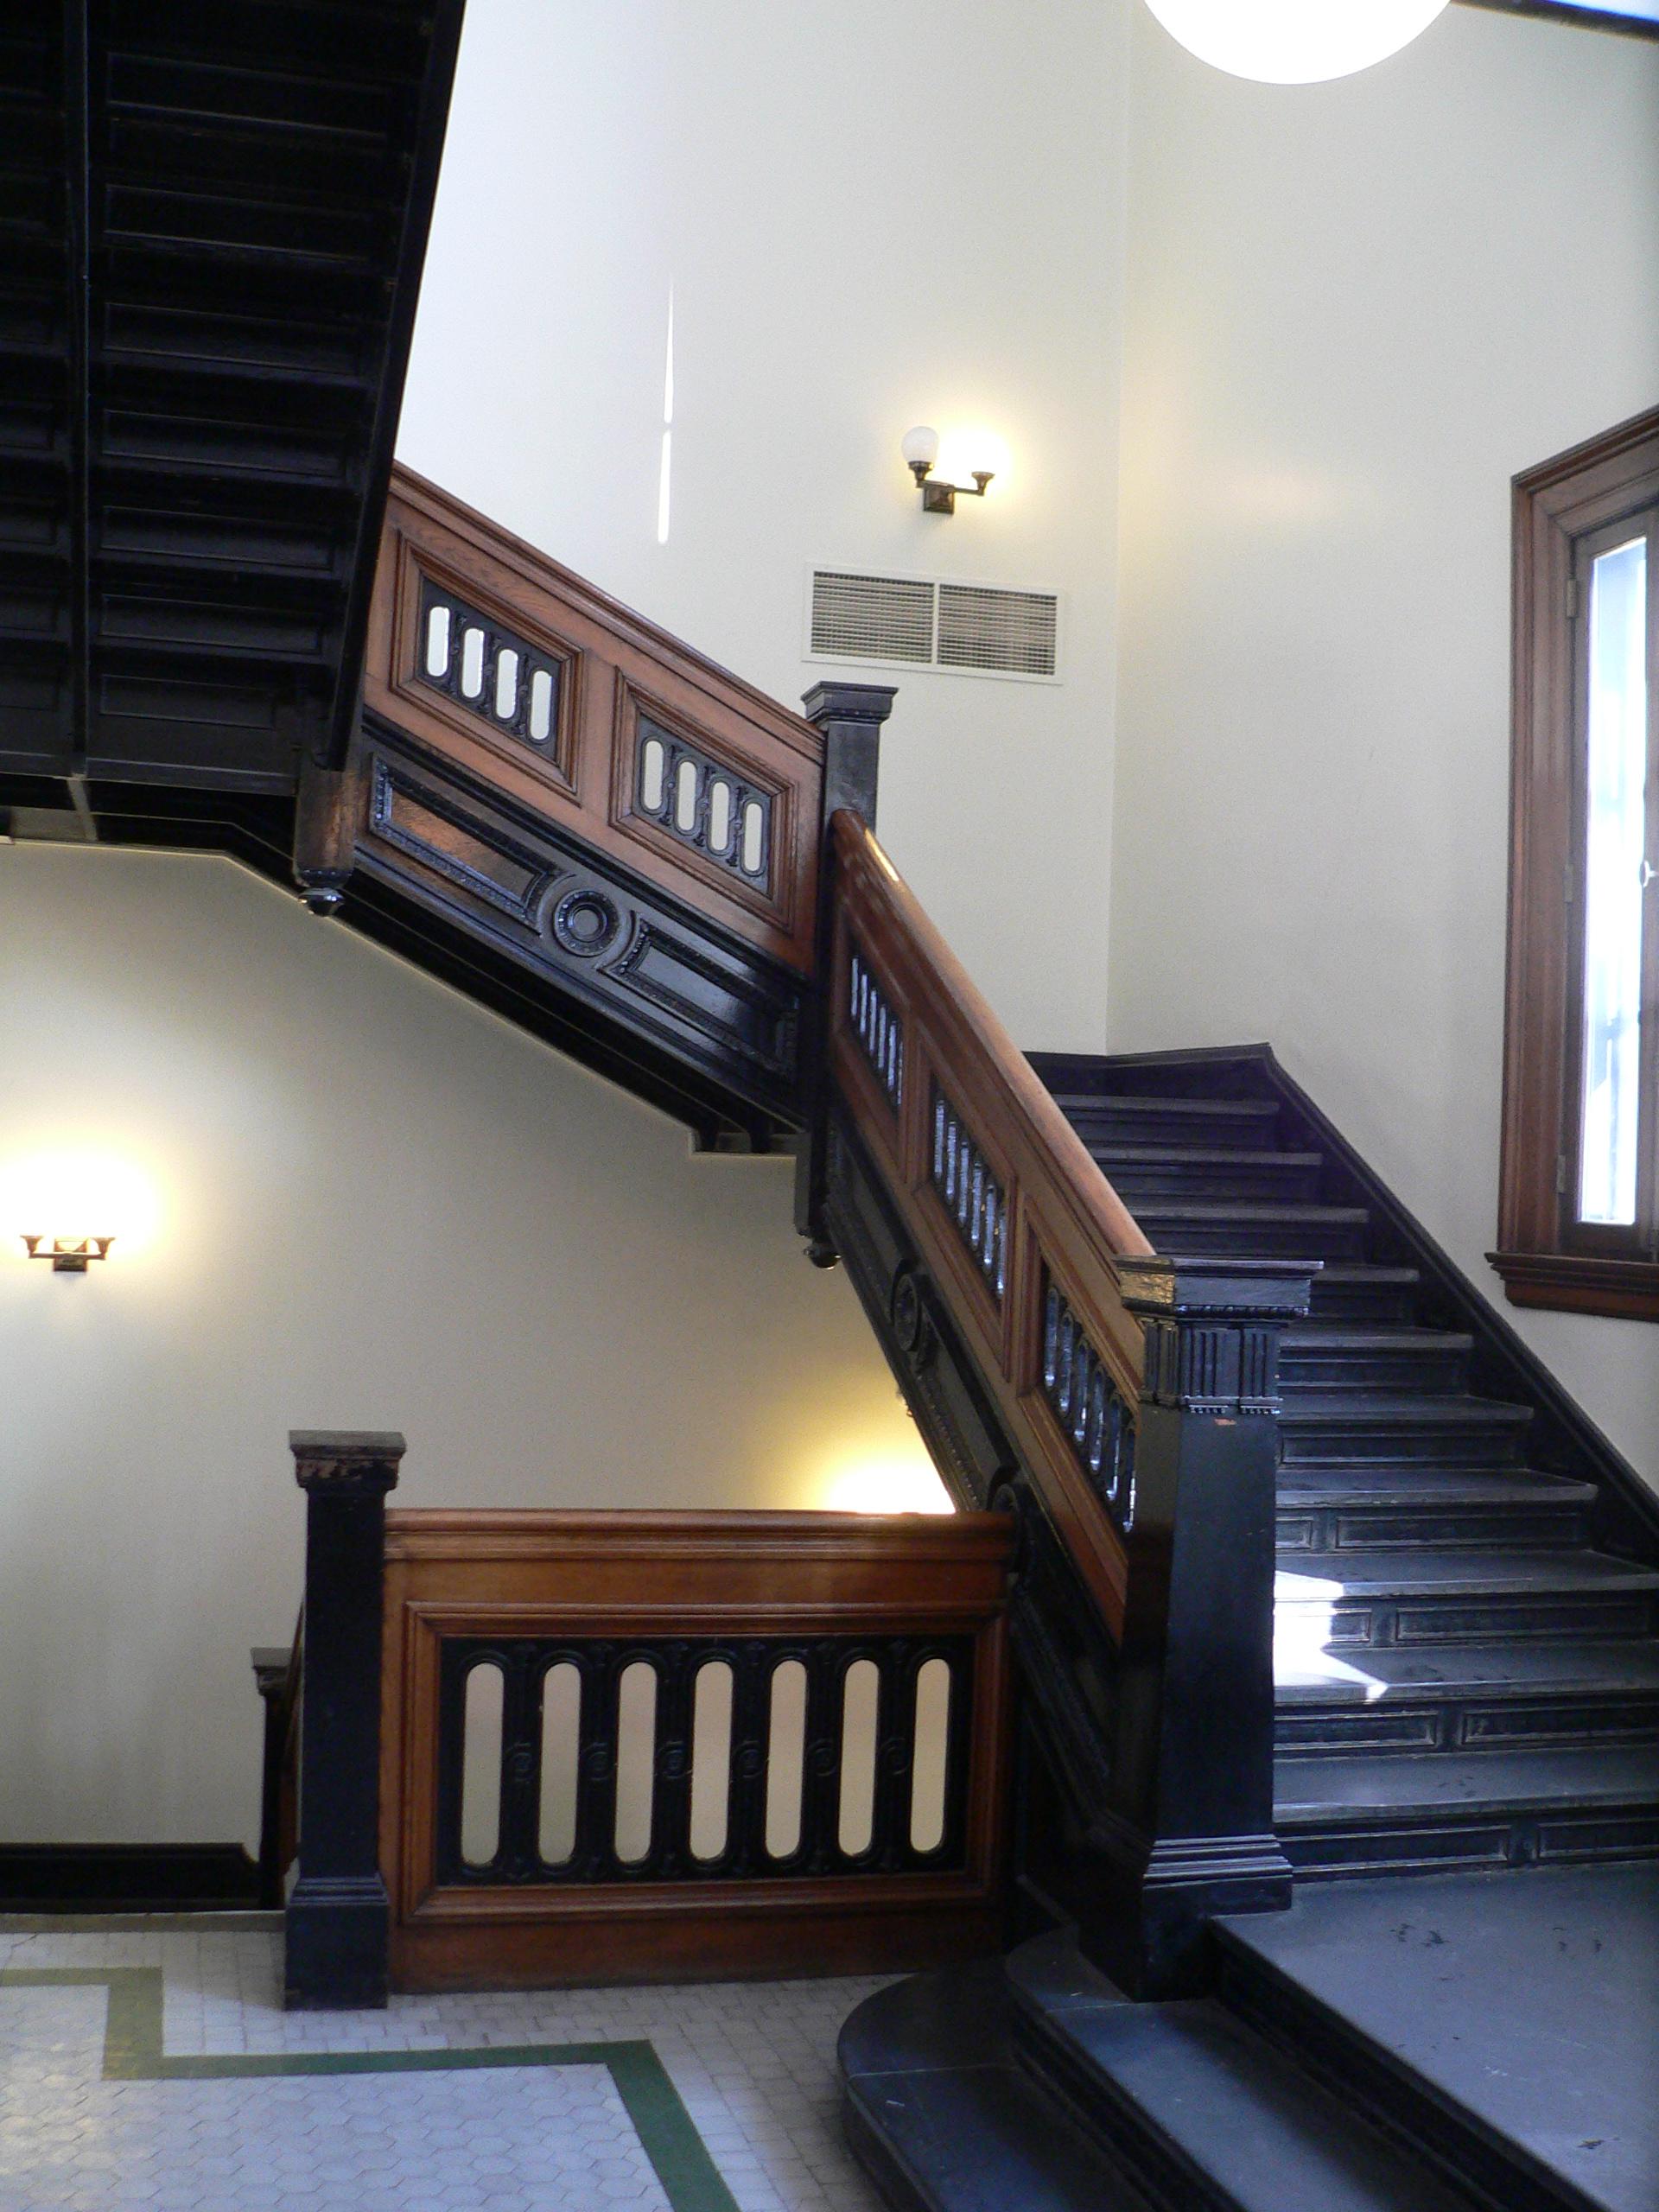 file:hall county courthouse (nebraska) interior staircase